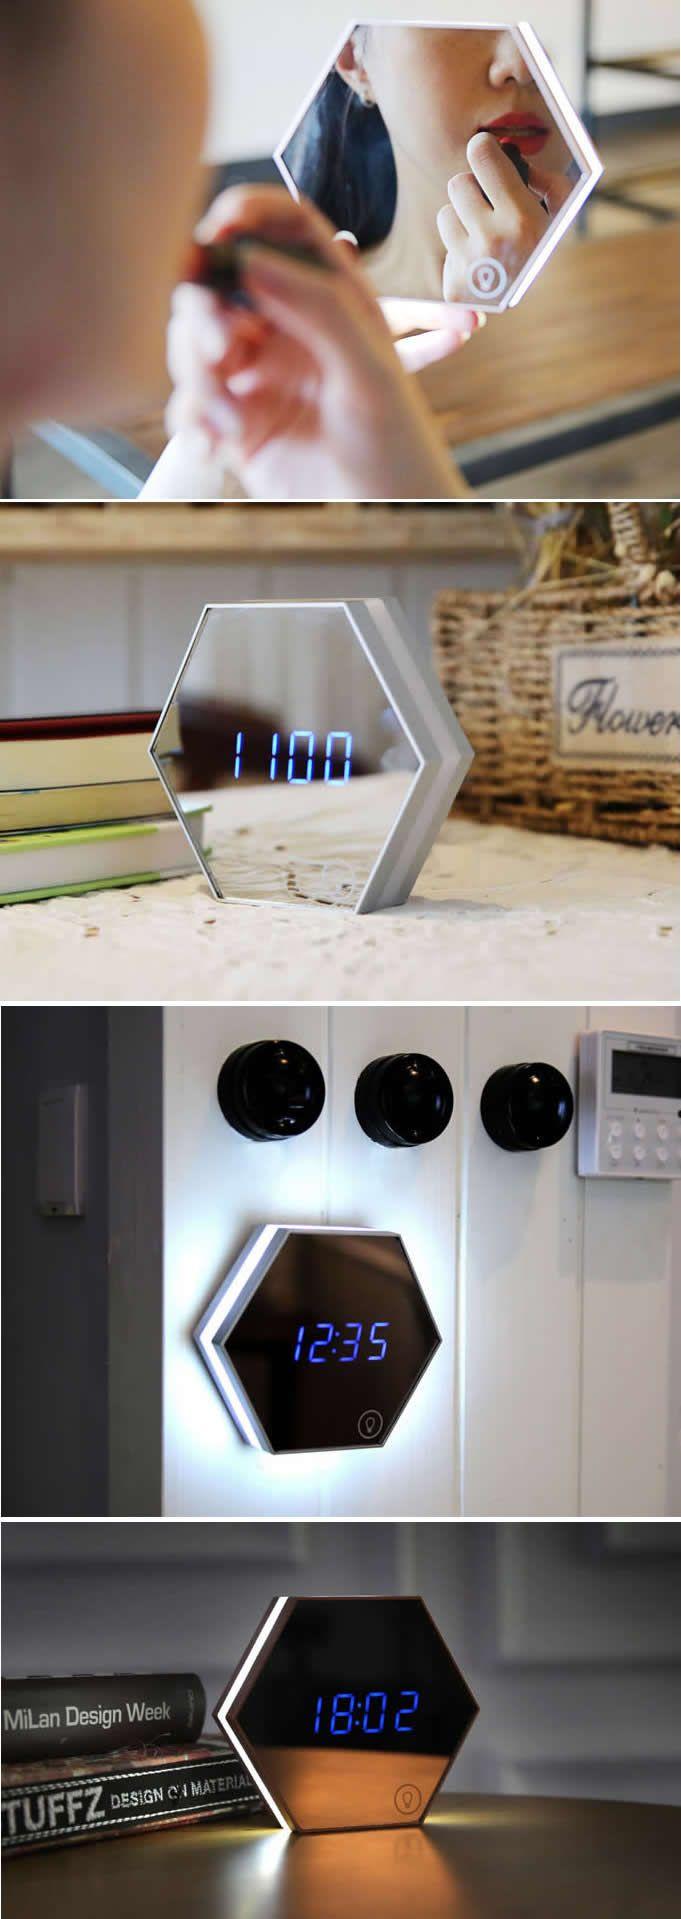 LED Night Light Digital Alarm Clock with Mirror-Finished Display